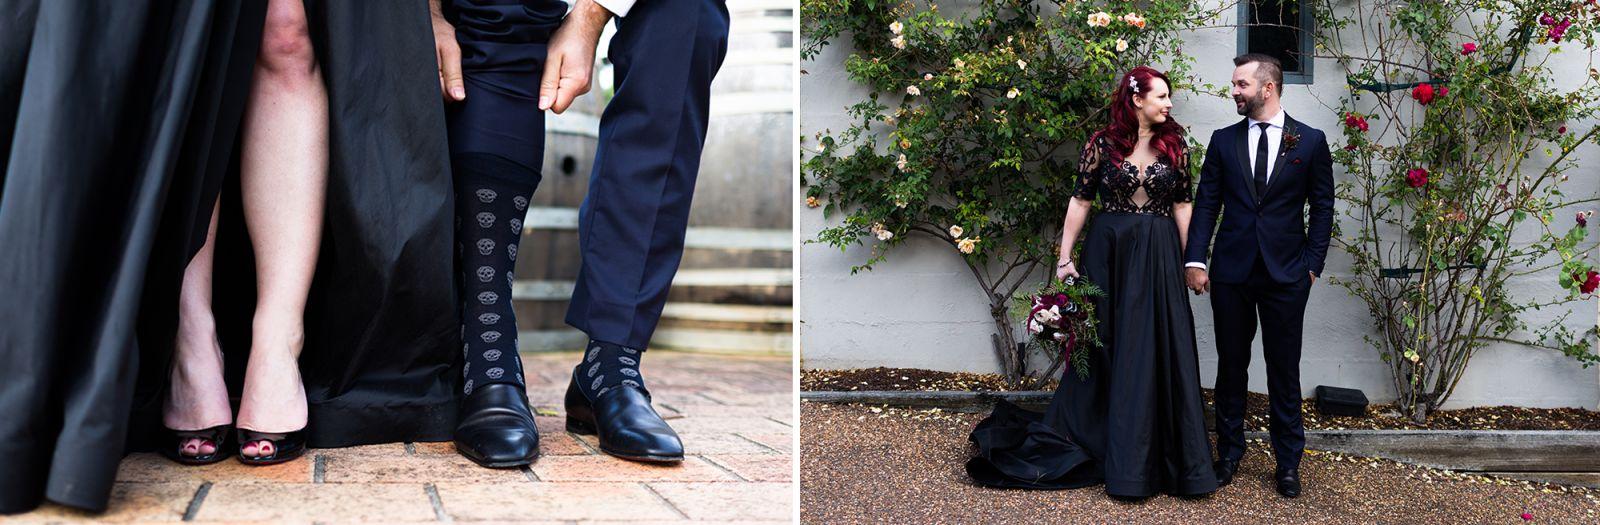 14_quriky-wedding-photography-at-wandin-valley-hunter-valley